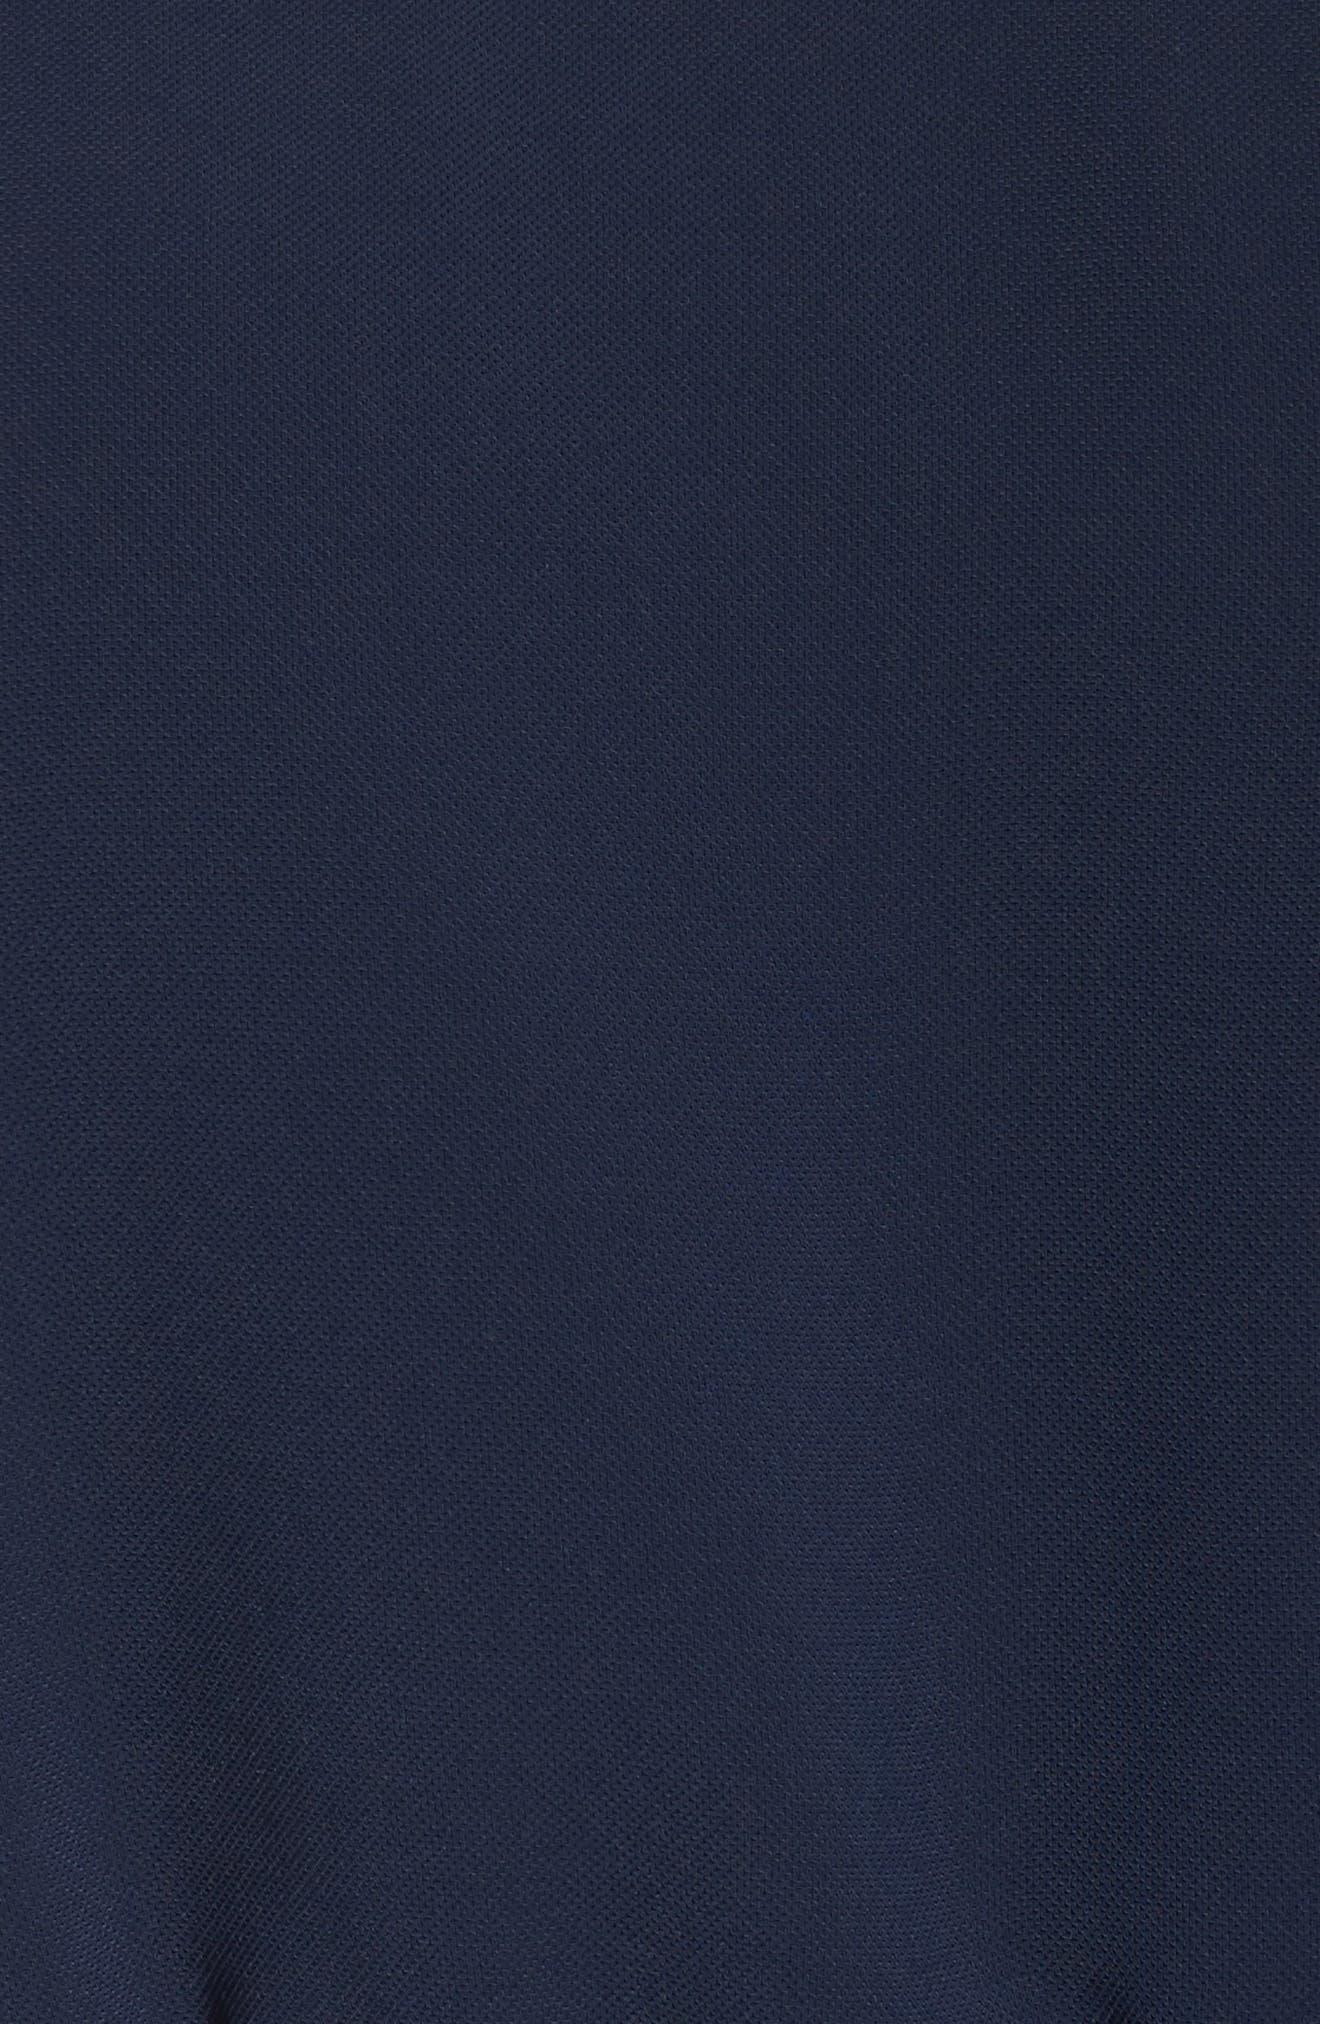 Crepe Belted Jumpsuit,                             Alternate thumbnail 5, color,                             411